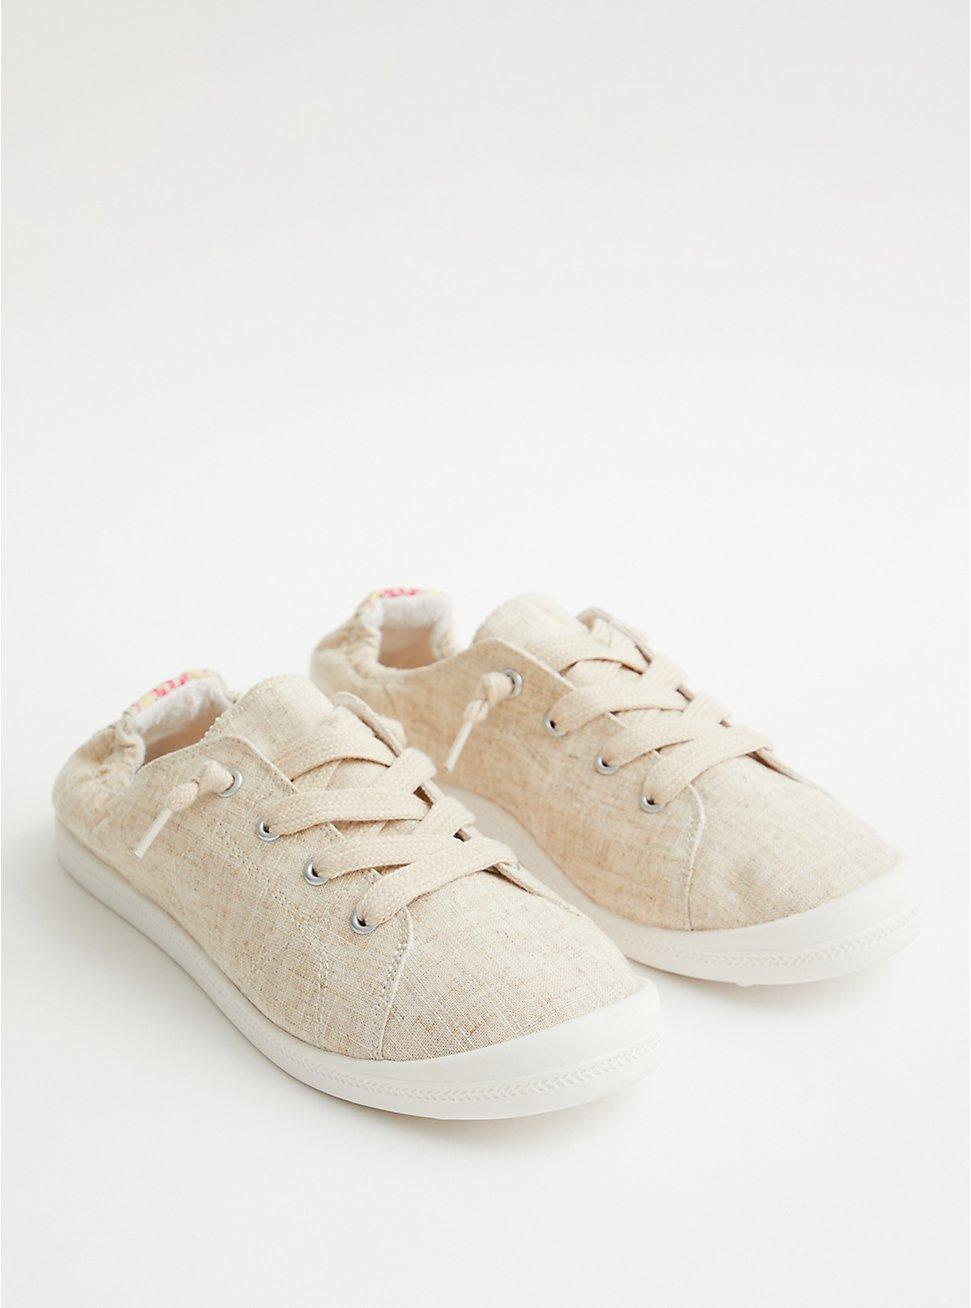 Riley - Natural Canvas Sneaker (WW), NATURAL, hi-res